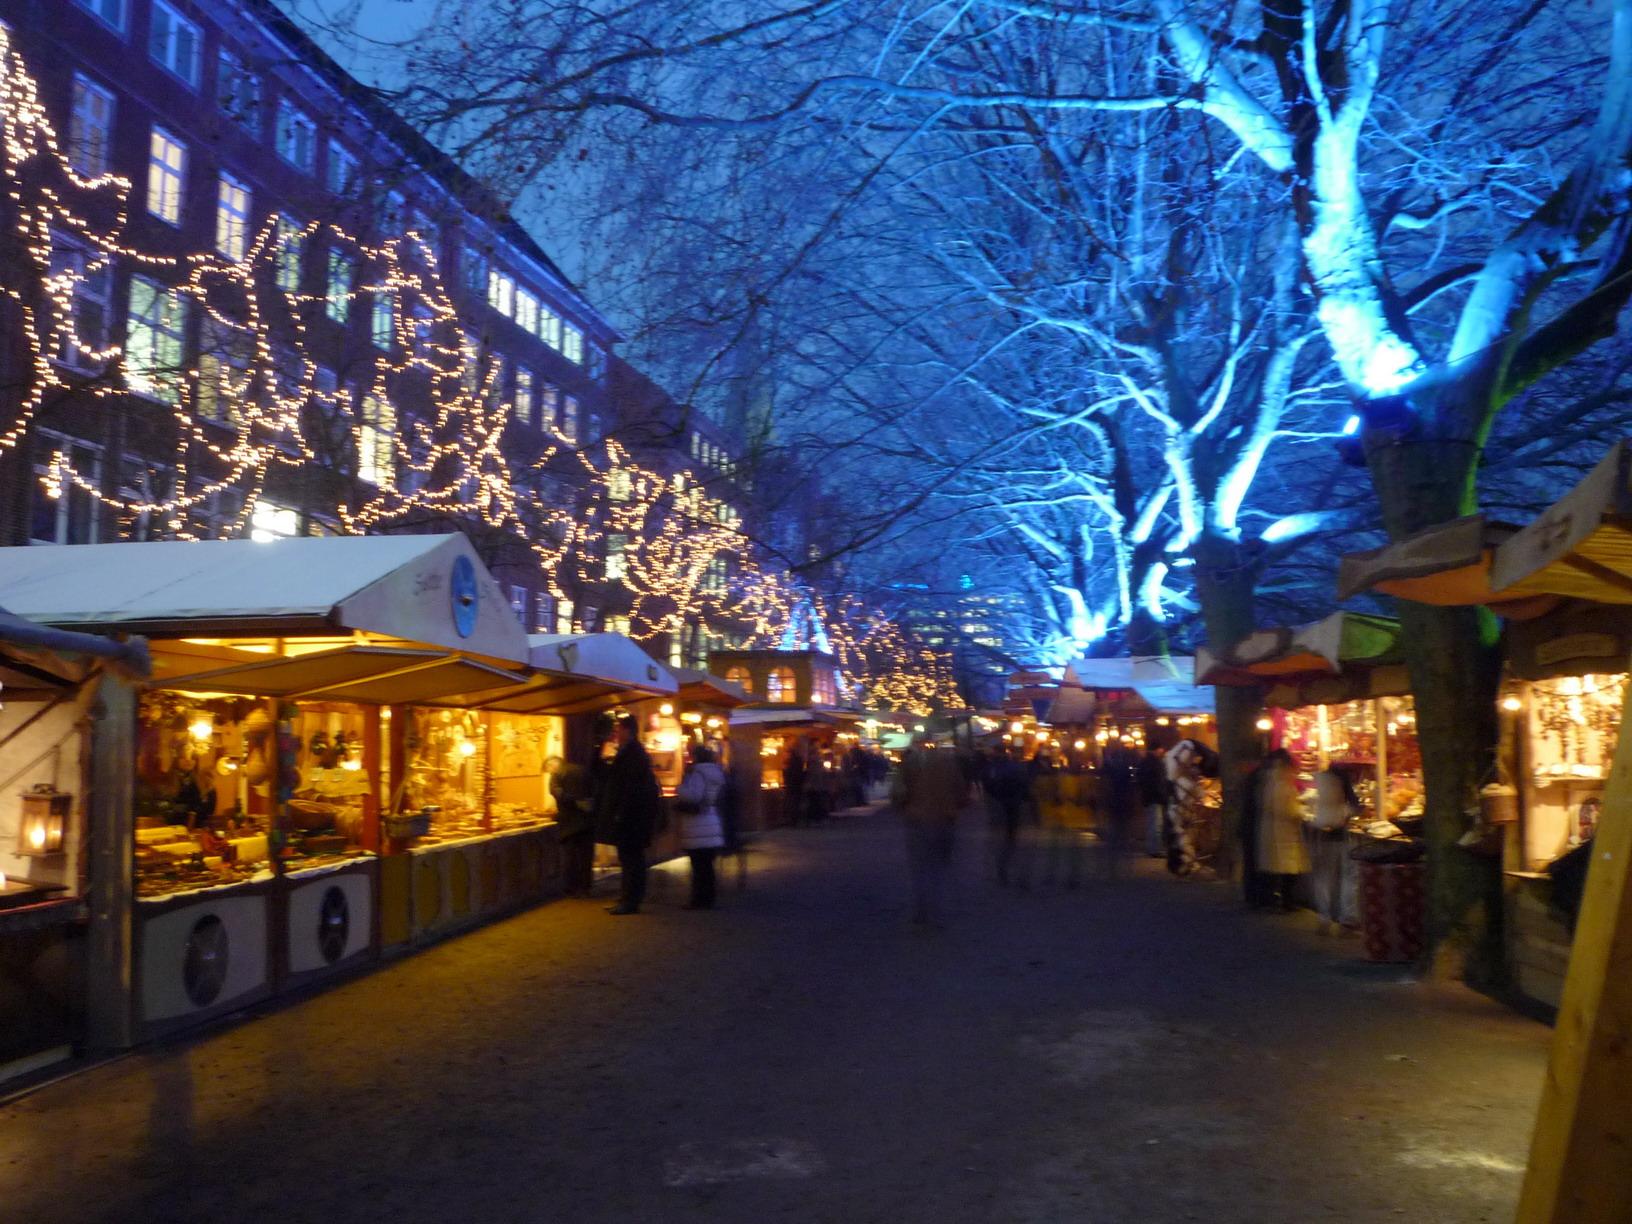 File:Bremen Weihnachtsmarkt 610-h.jpg - Wikimedia Commons